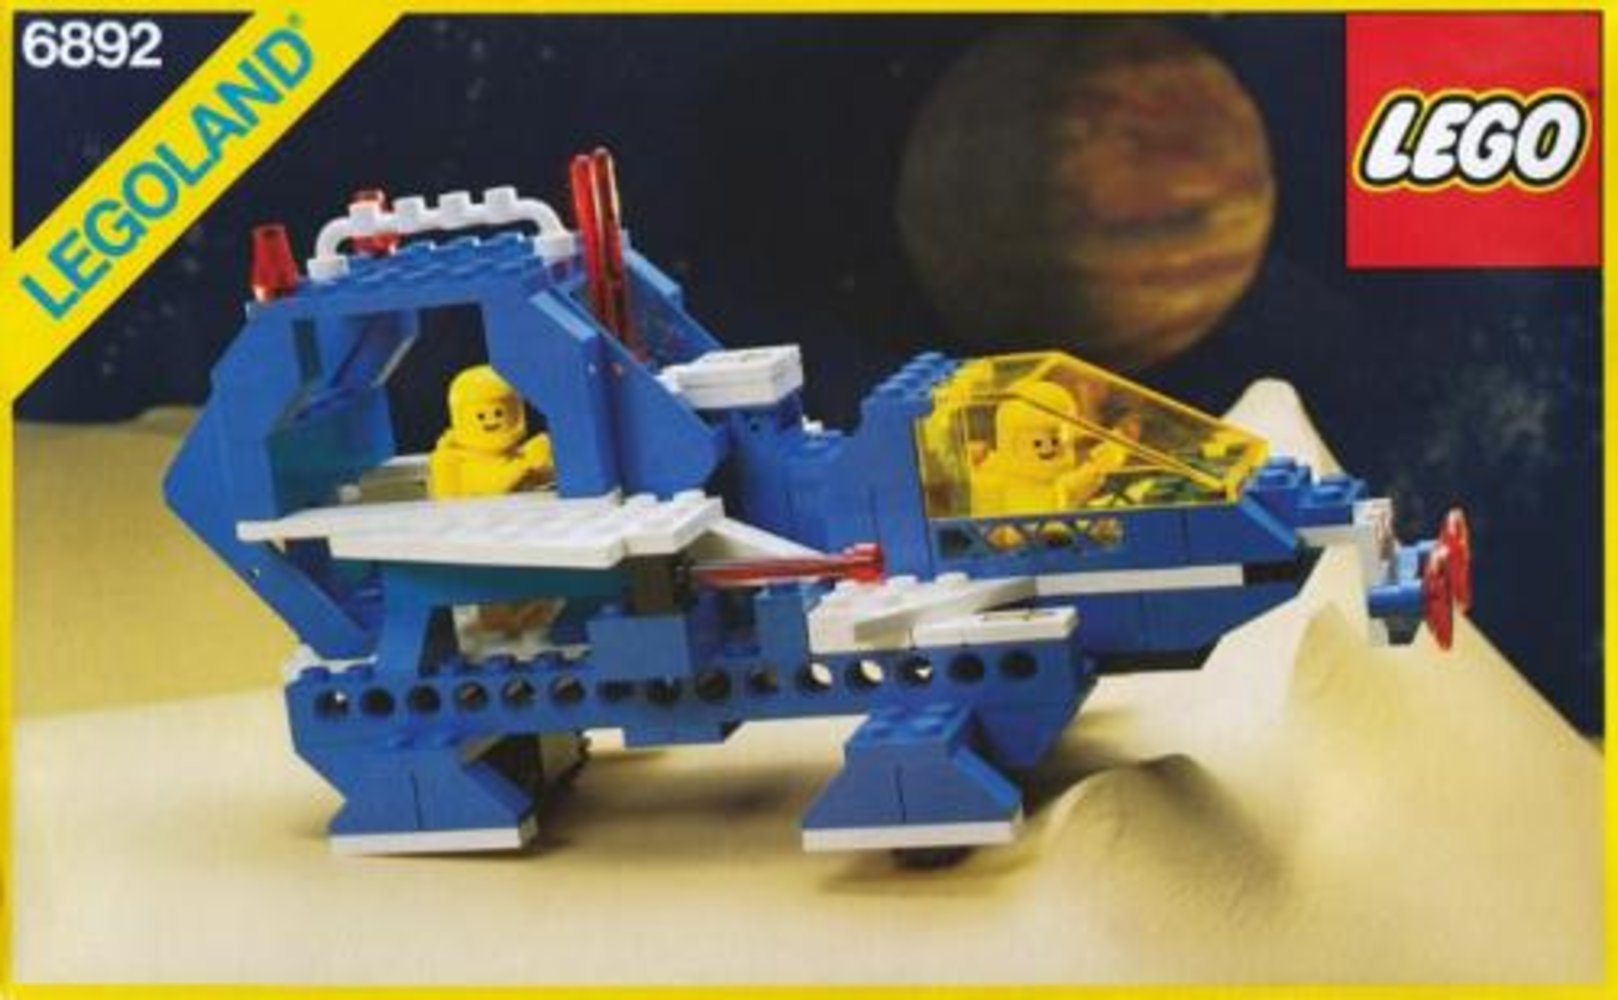 Modular Space Transport